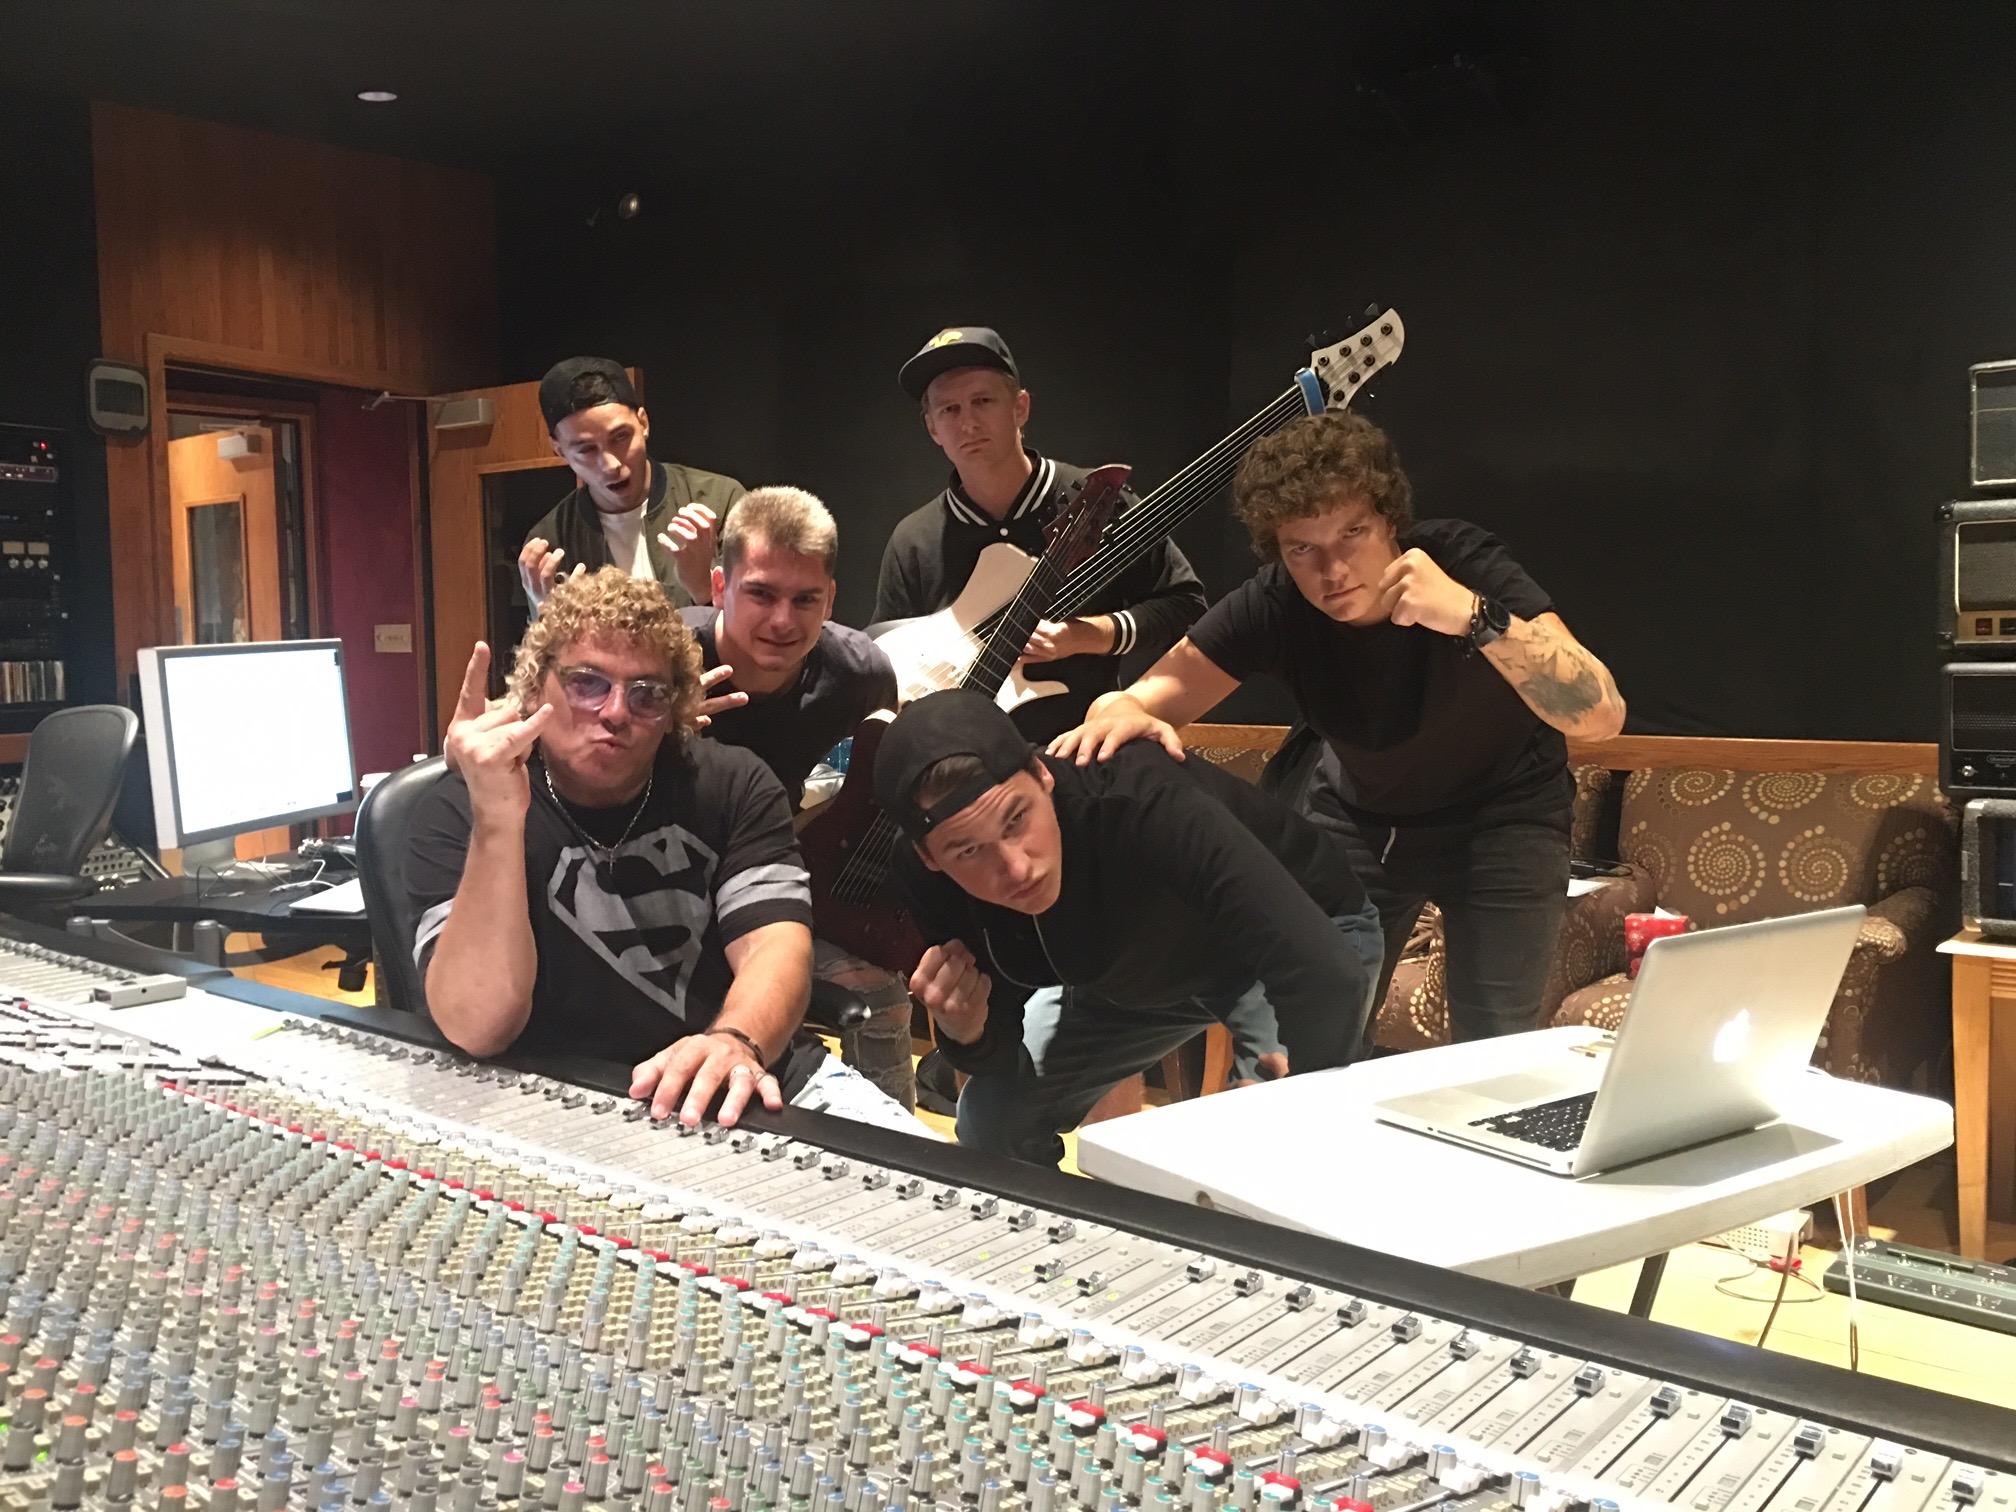 Working hard in Nashville with Blitz Union